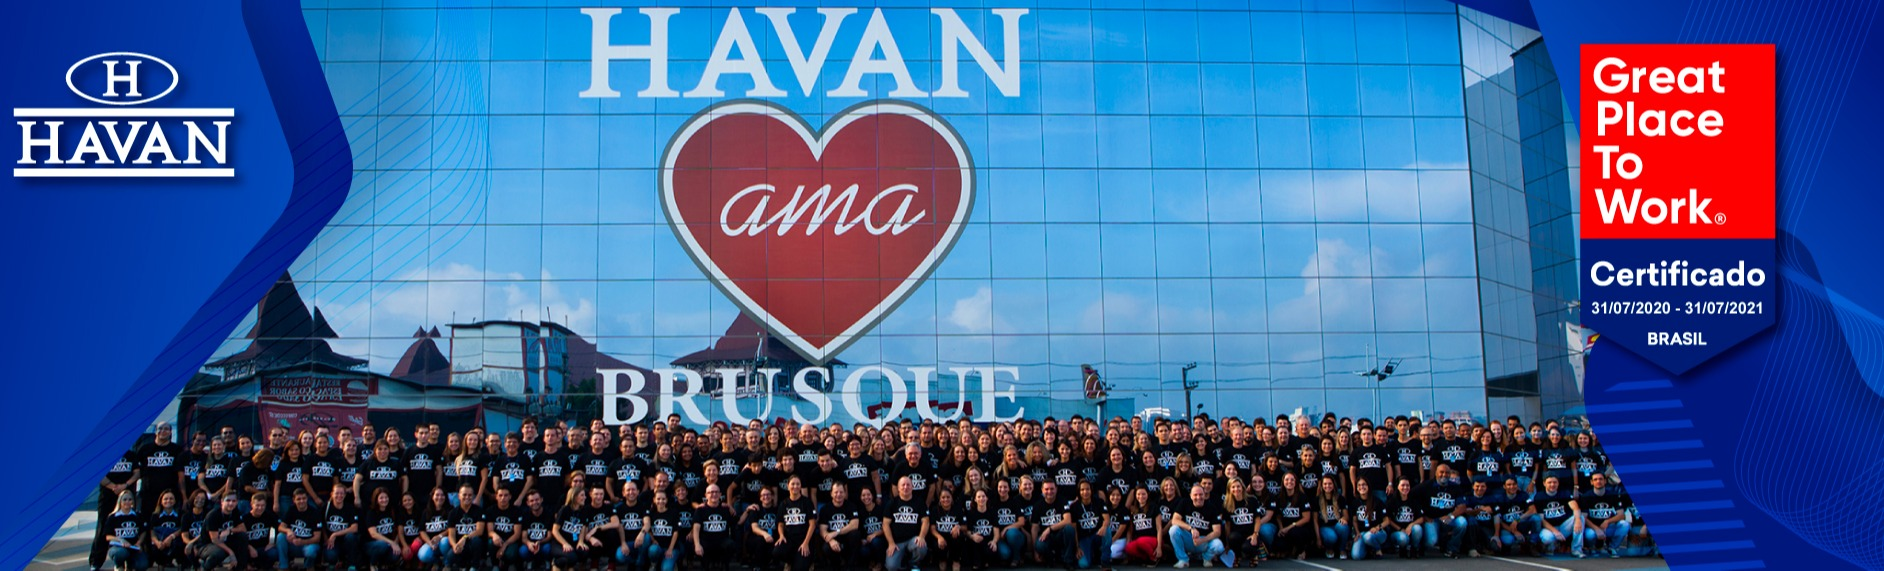 Centro Administrativo Havan